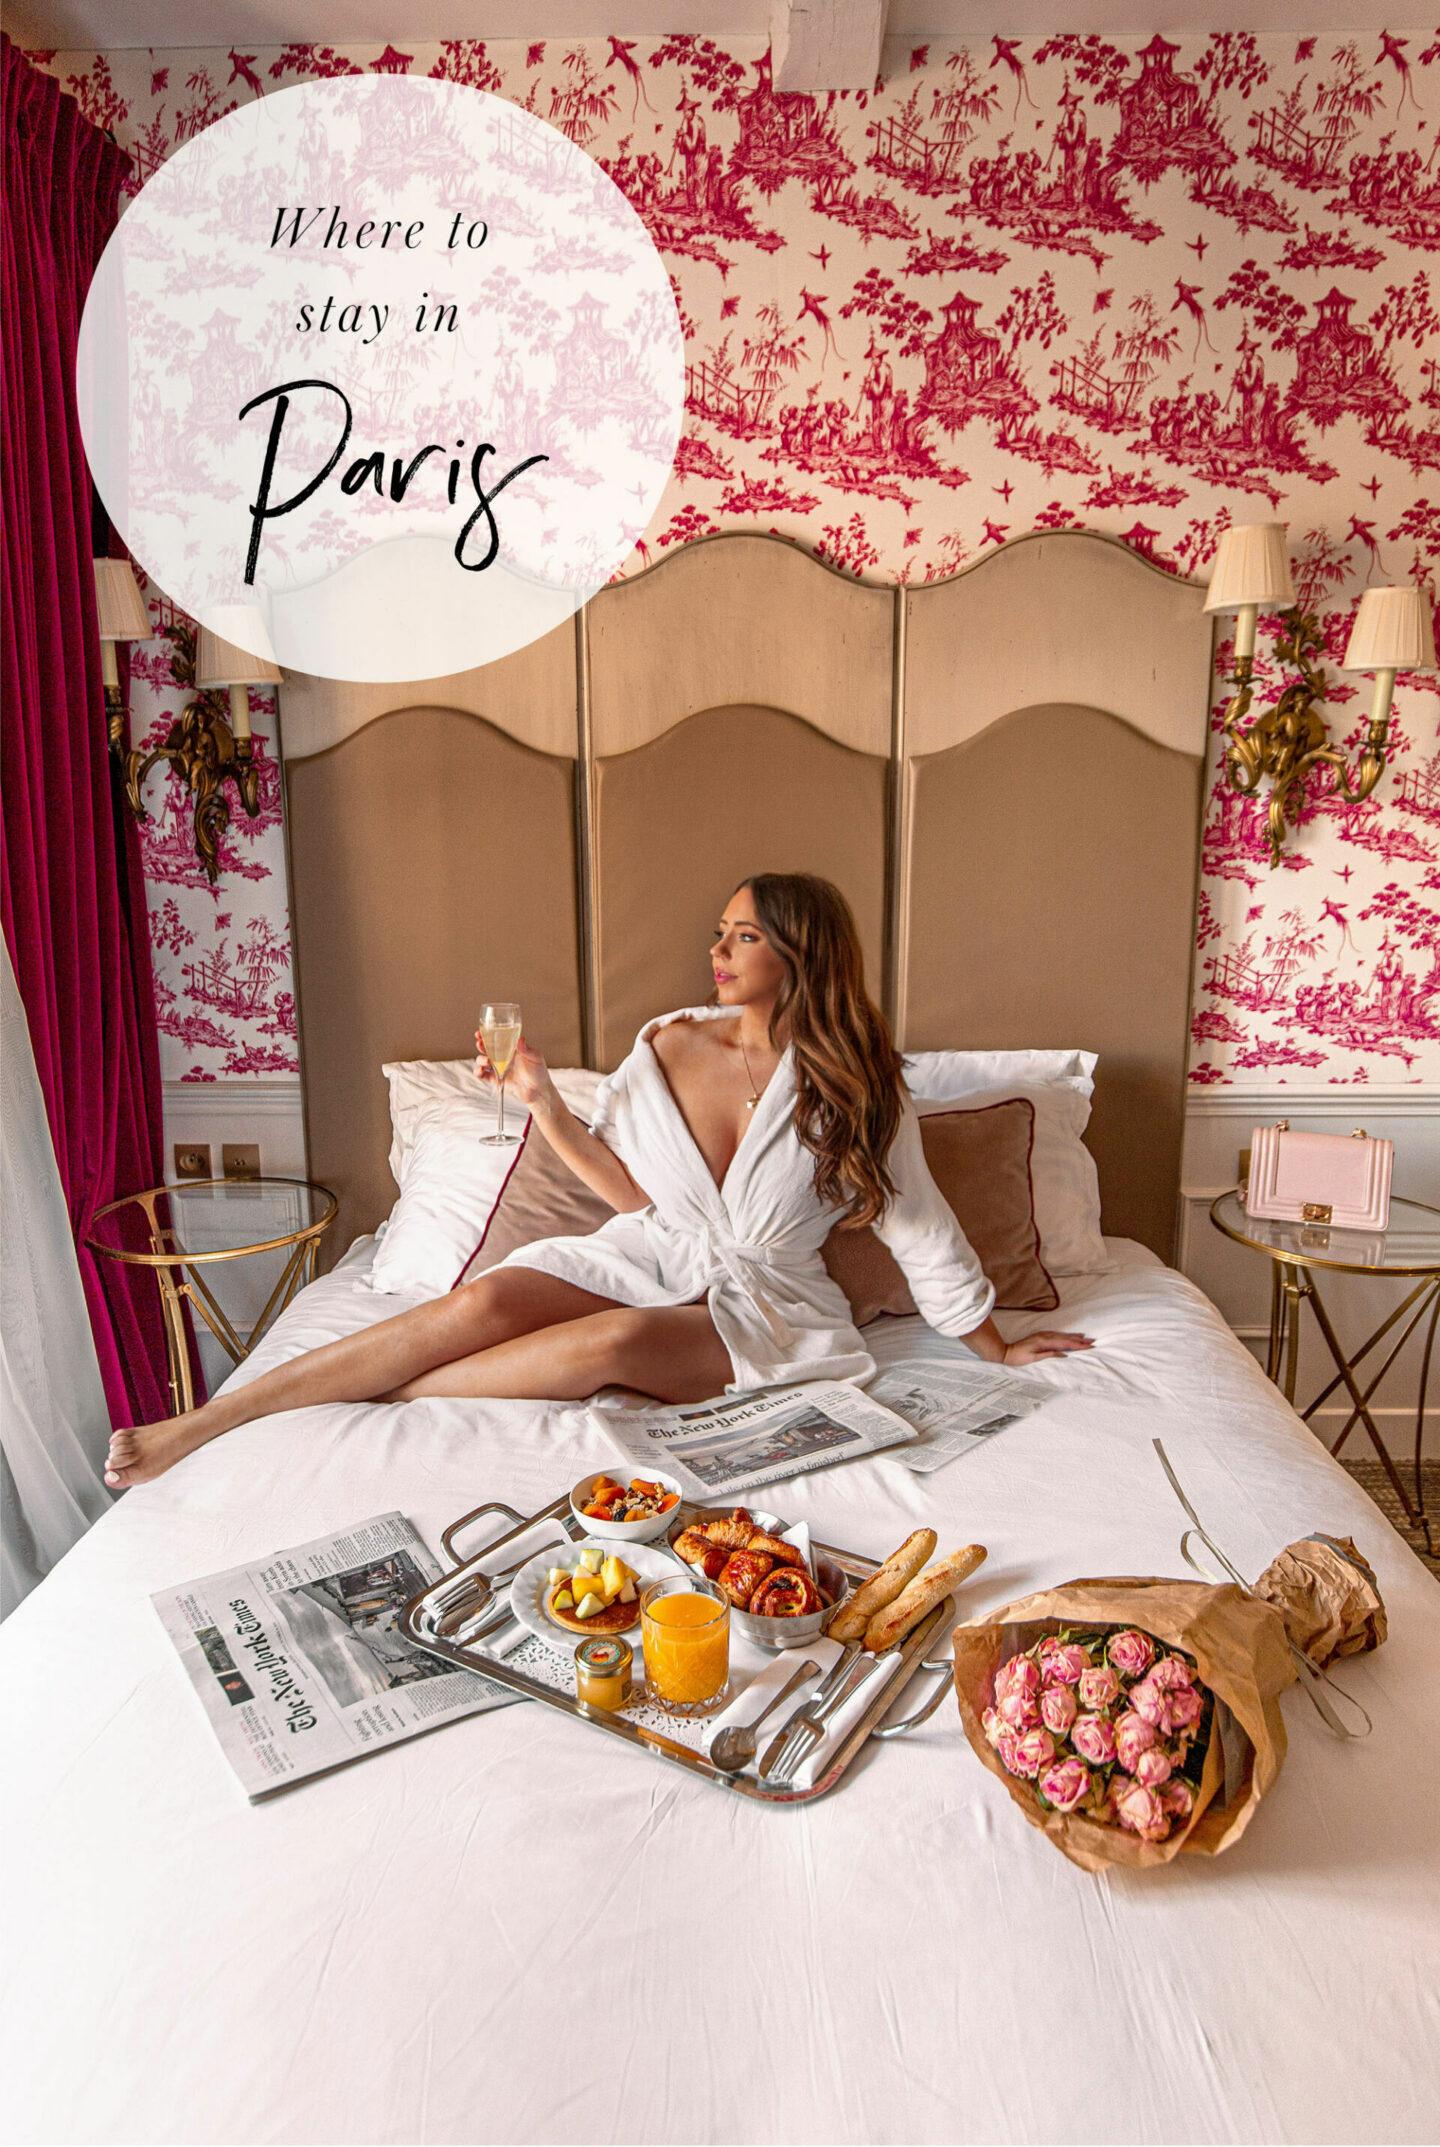 Where to stay in Paris – Paris Boutique Hotel - Best Hotels in Paris – kelseyinlondon – Hotel Favart